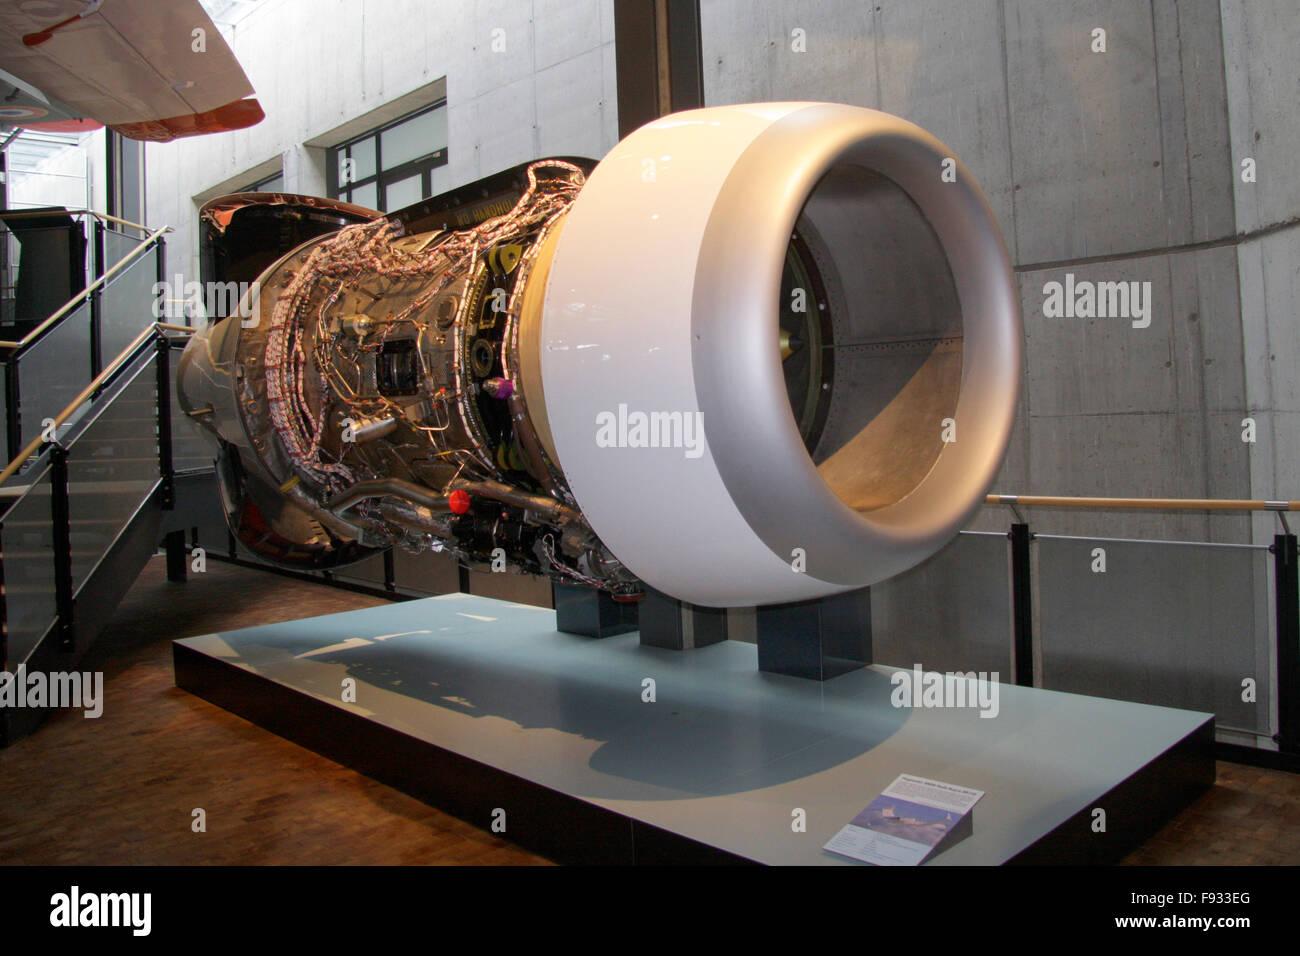 Turbine eines Duesenjets - Deutsches Technikmuseum, Berlin-Kreuzberg. - Stock Image